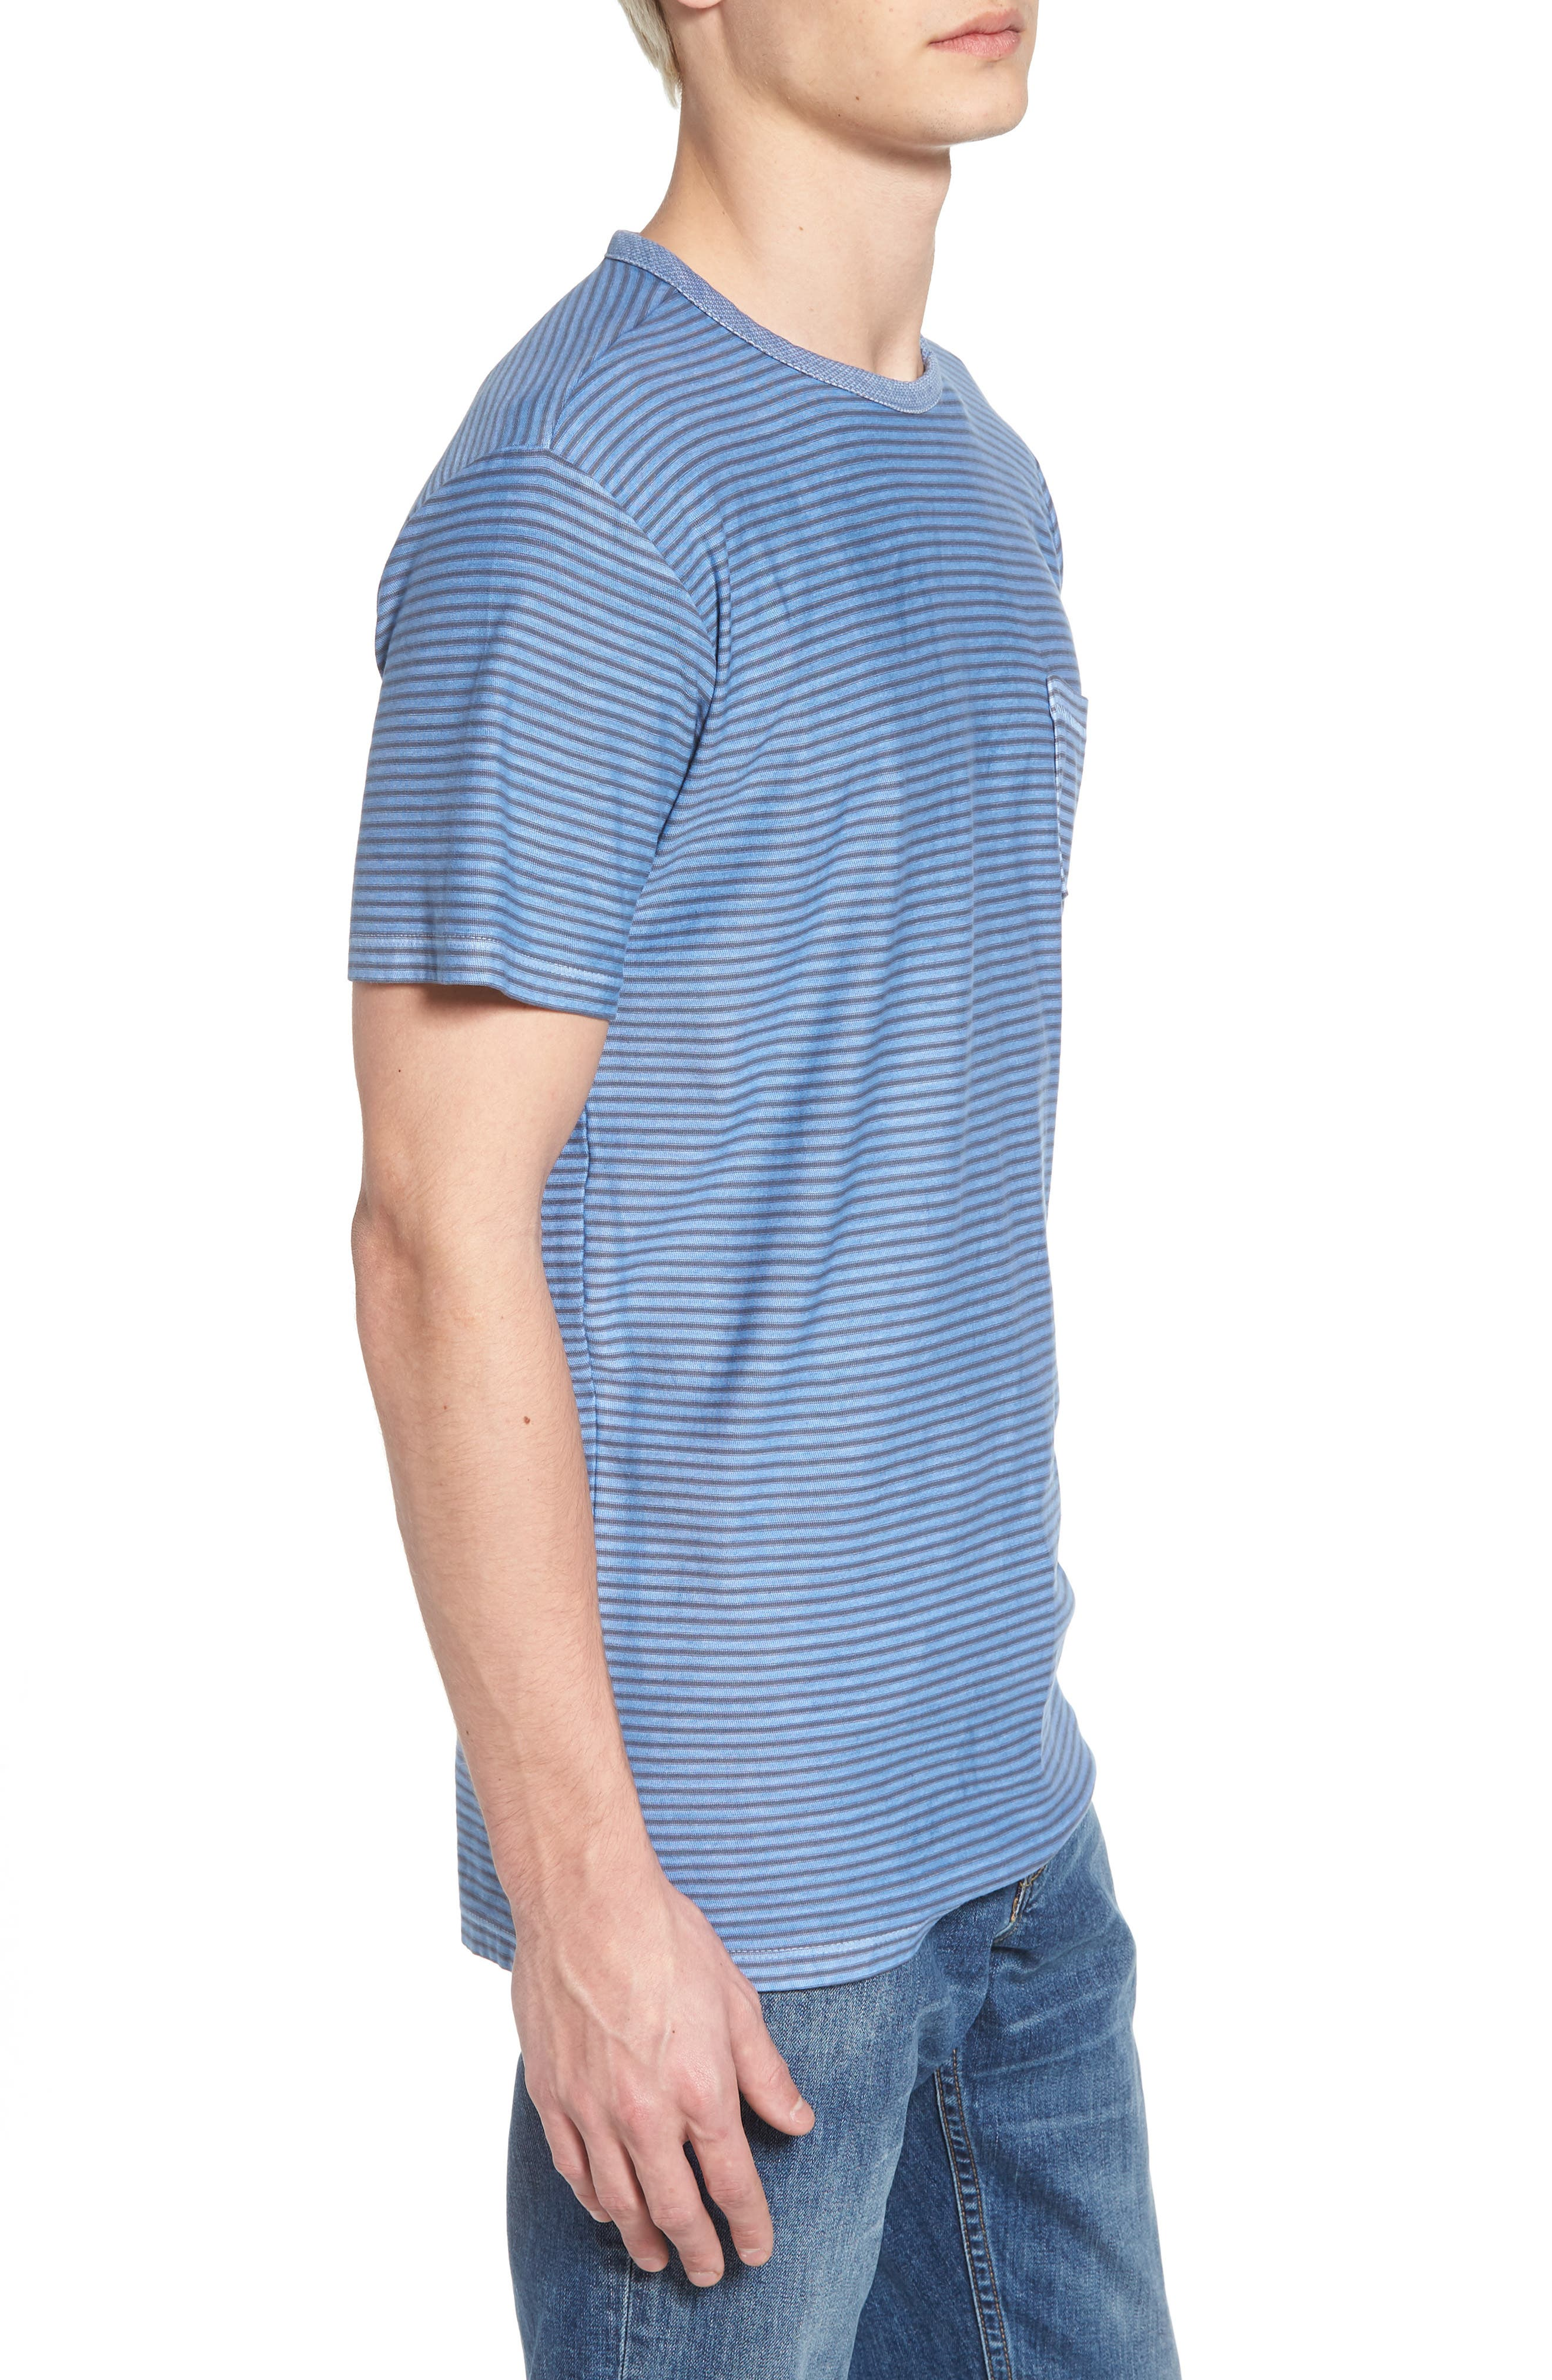 Stringer T-Shirt,                             Alternate thumbnail 3, color,                             Powder Blue